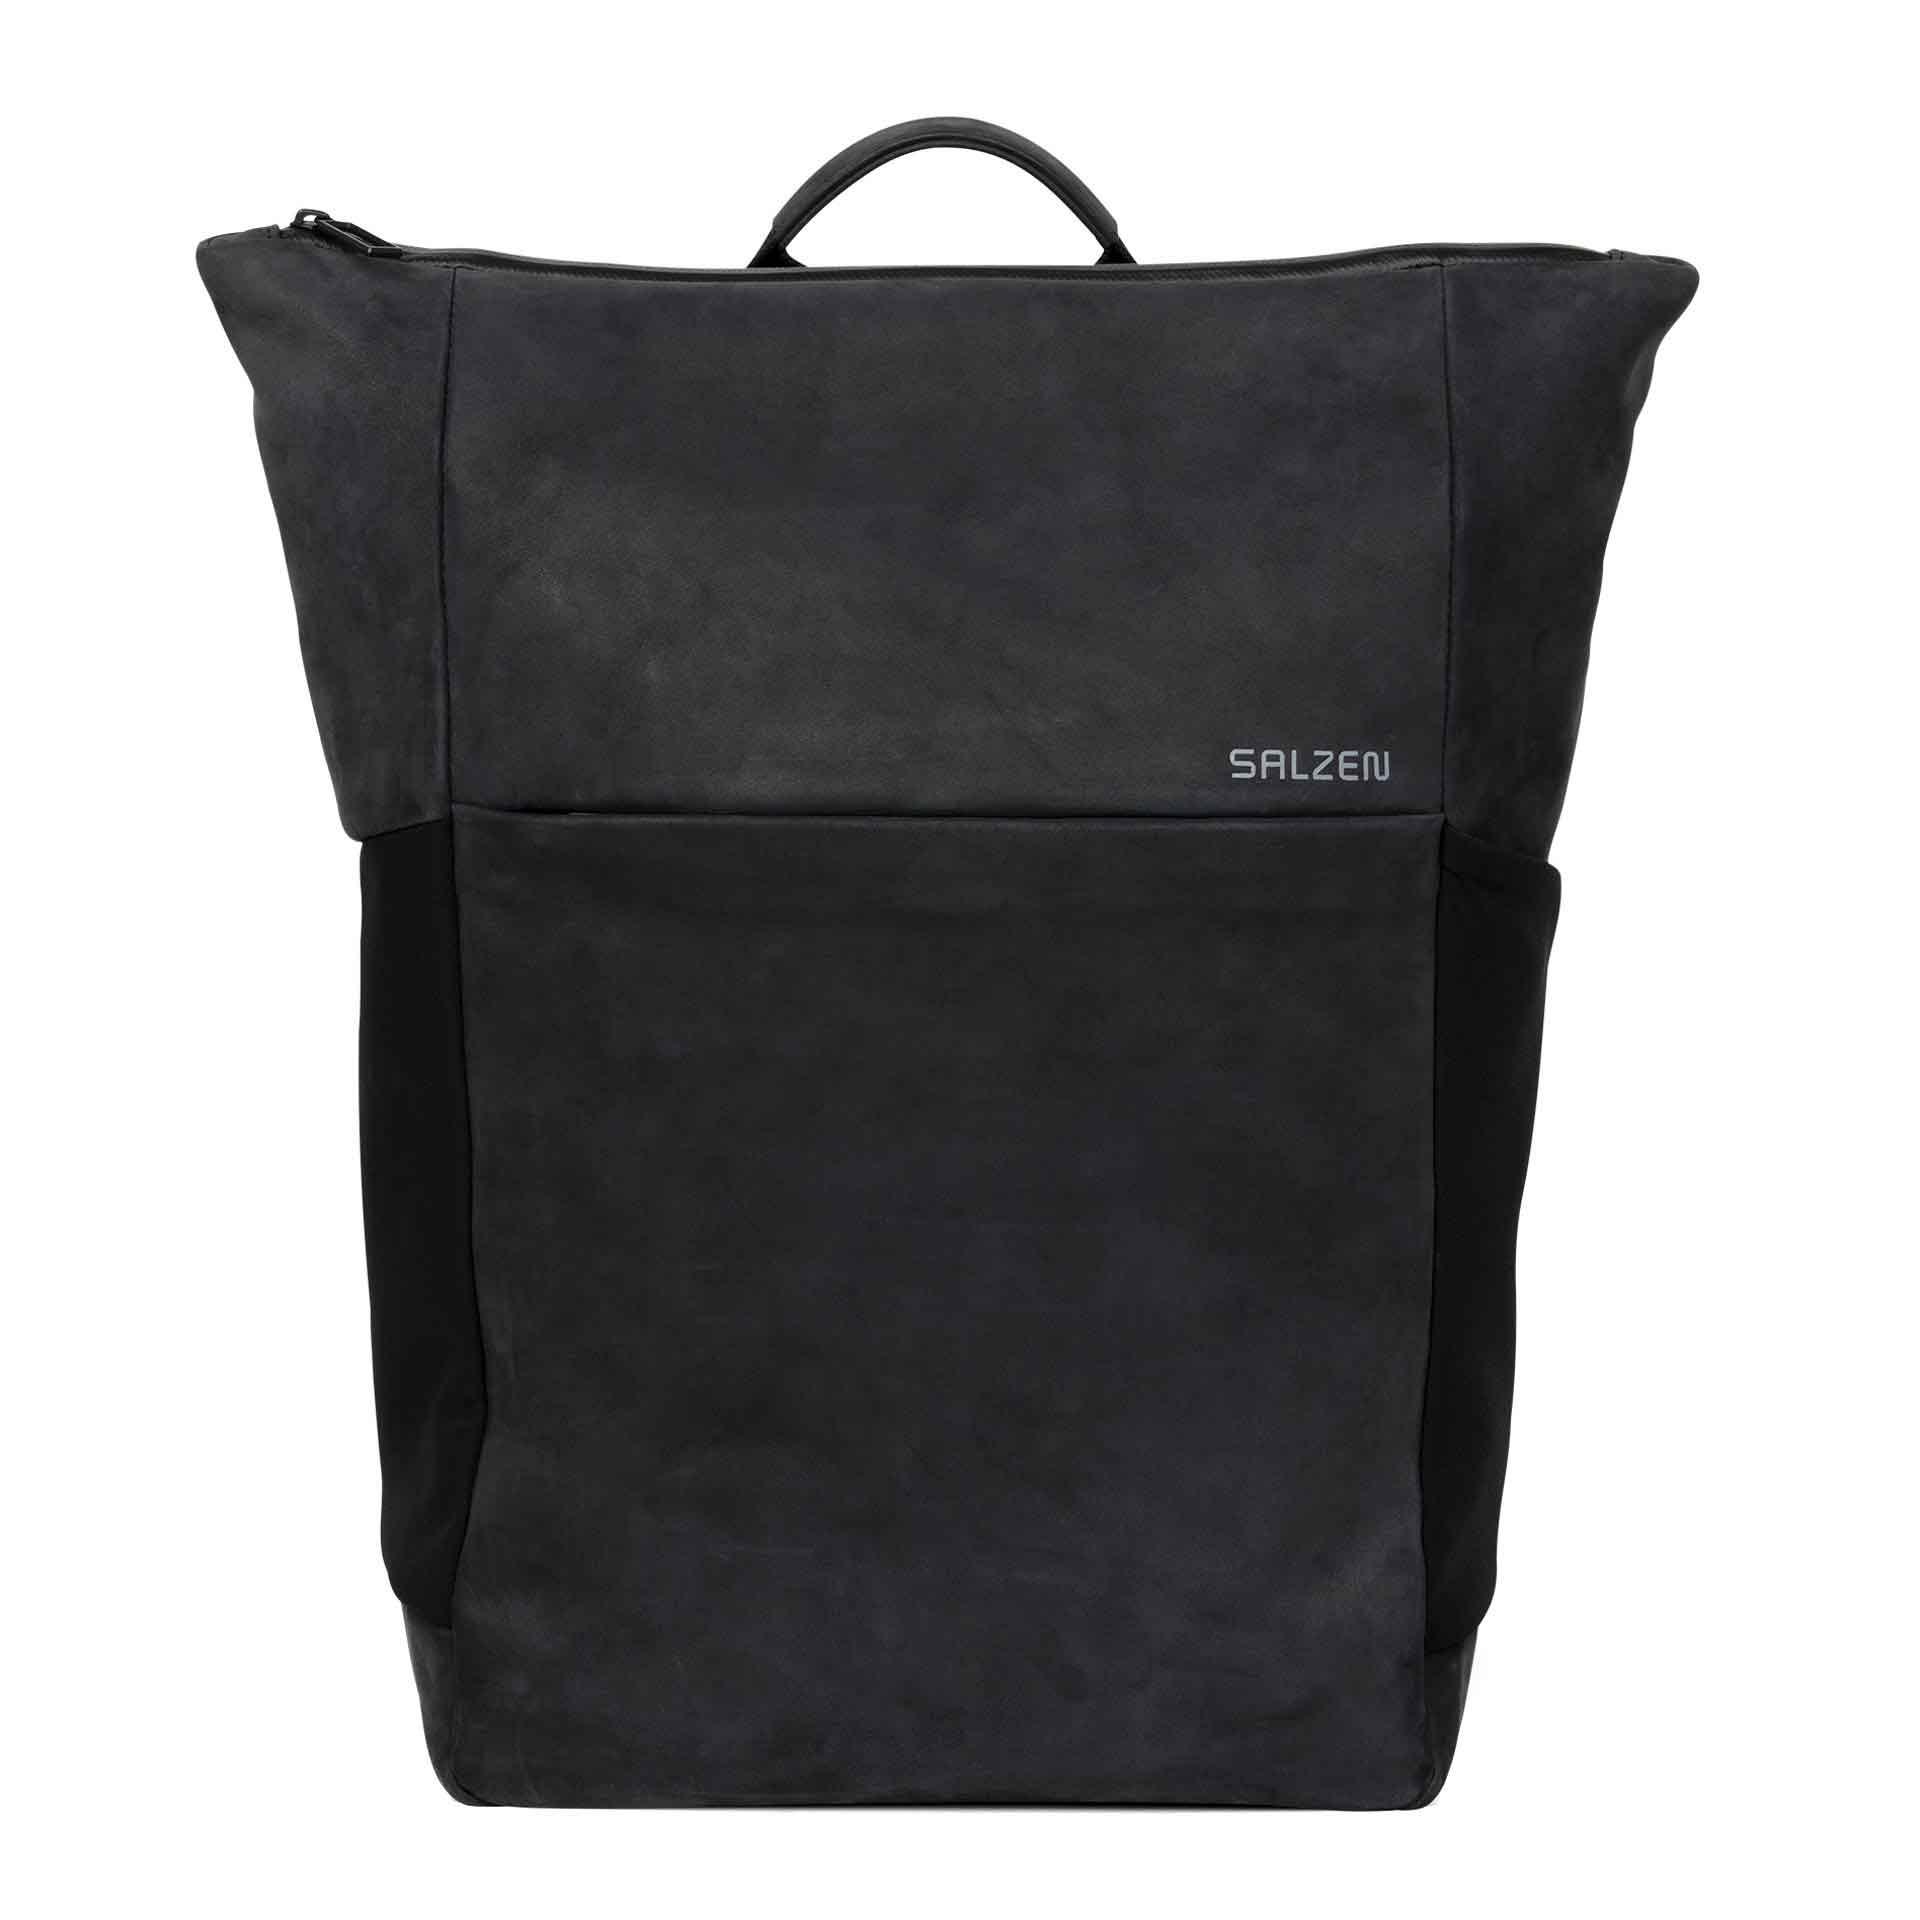 Salzen Vertiplorer Leather Plain Backpack charcoal black